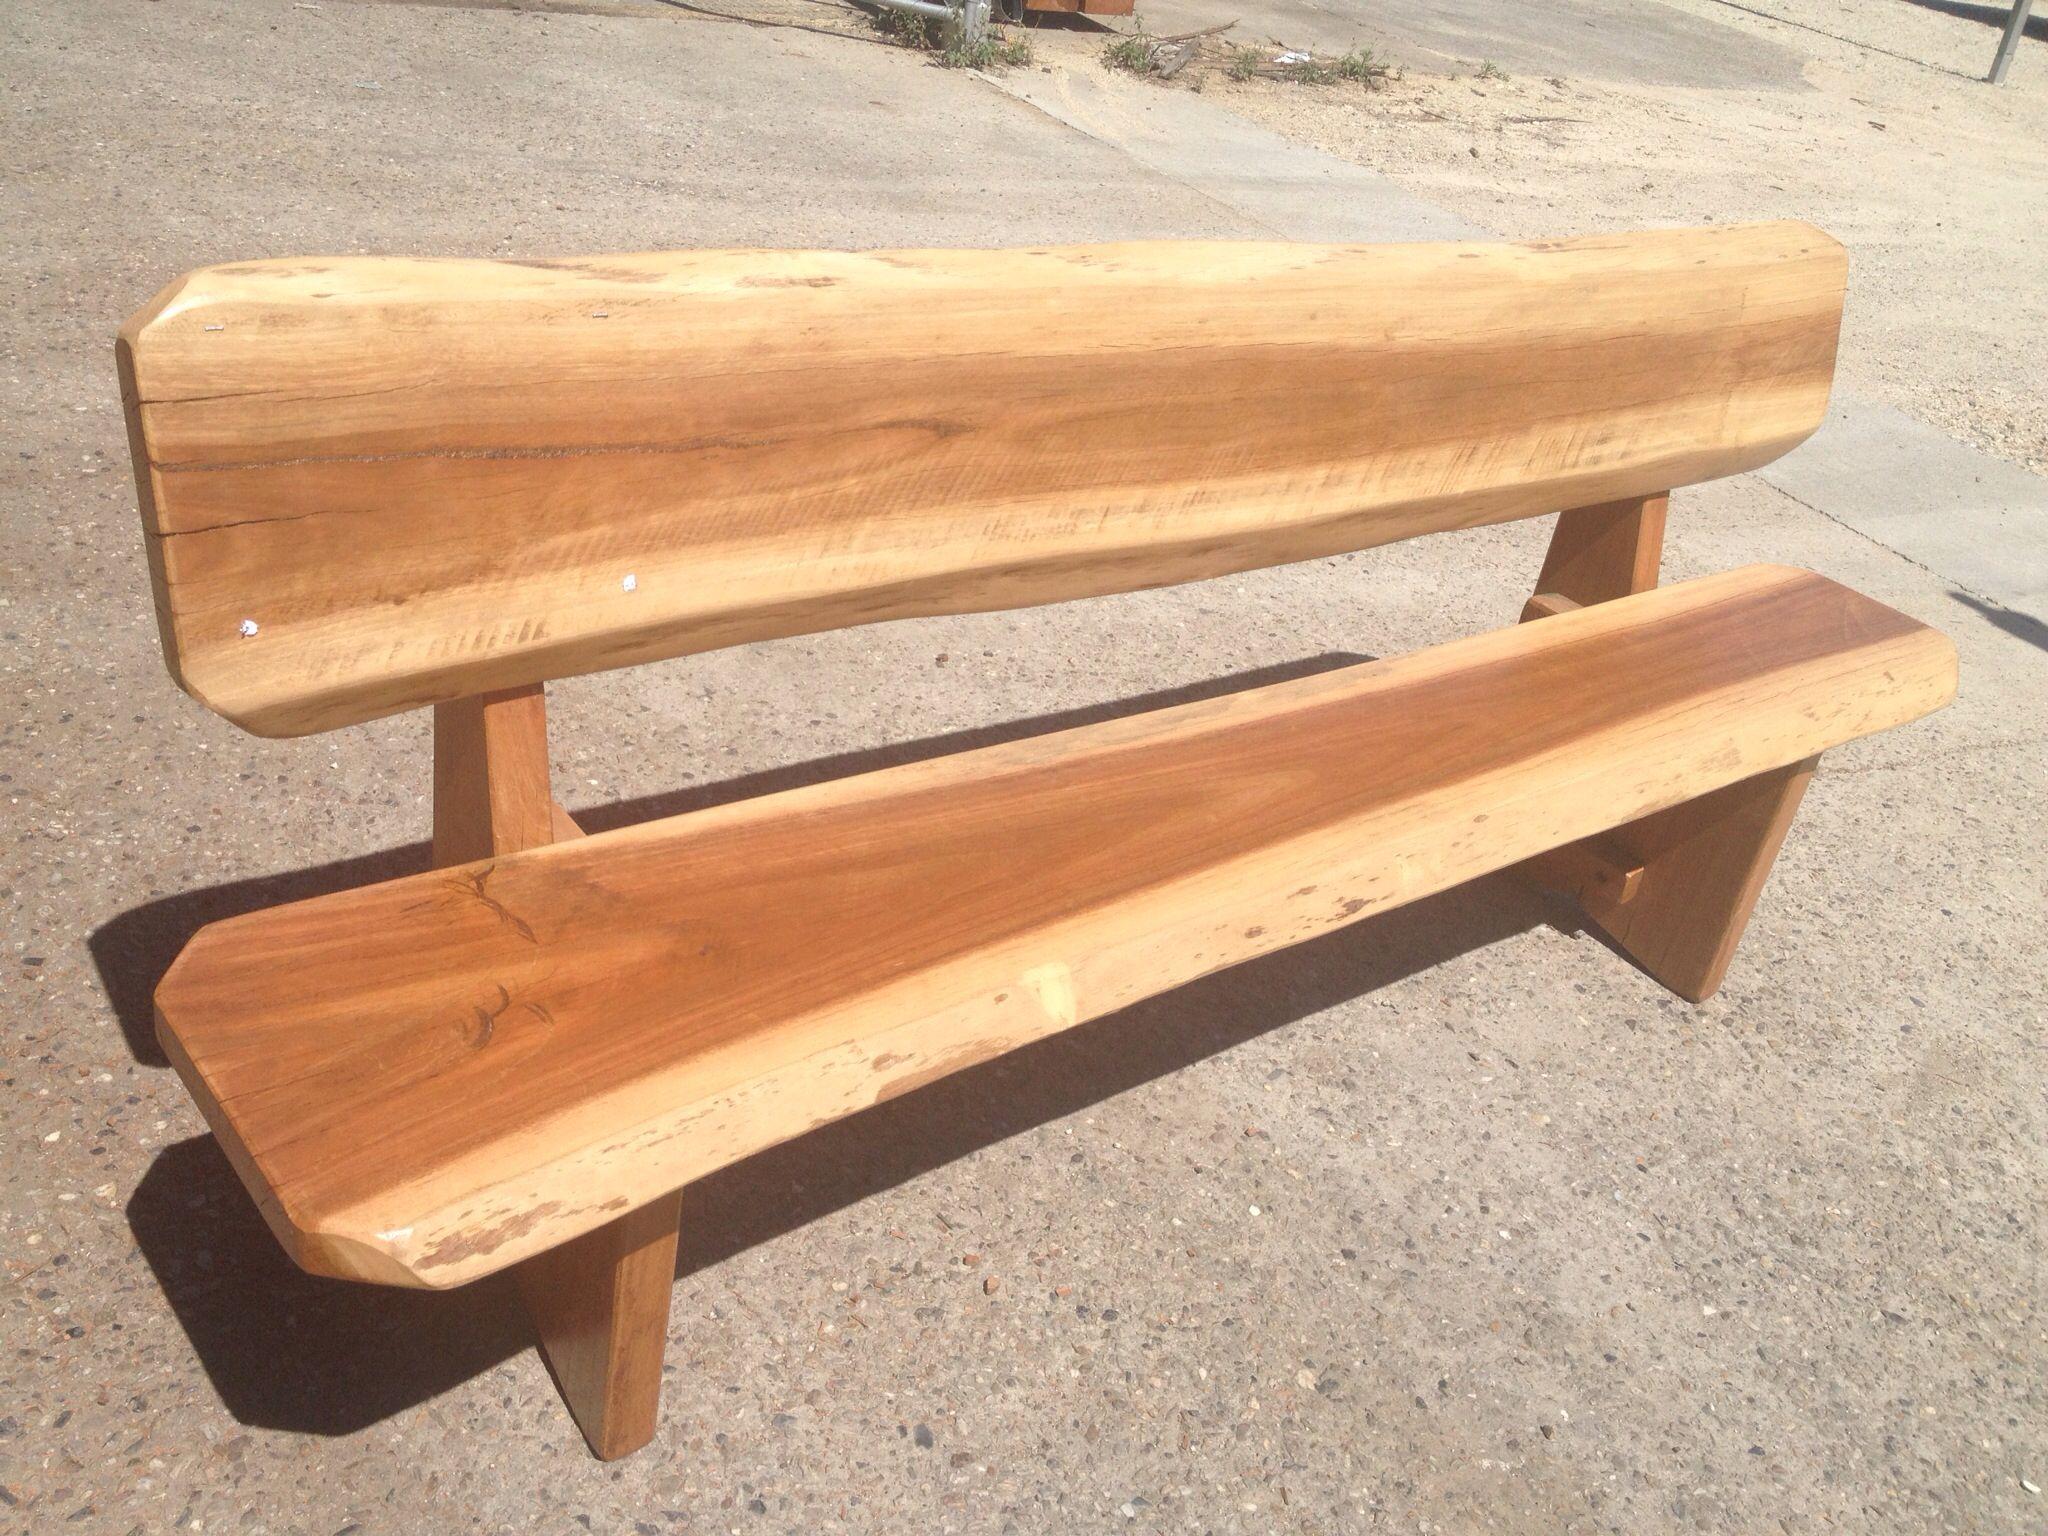 Hardwood Slab Garden Seats 1900 mm long coated for external use in ...